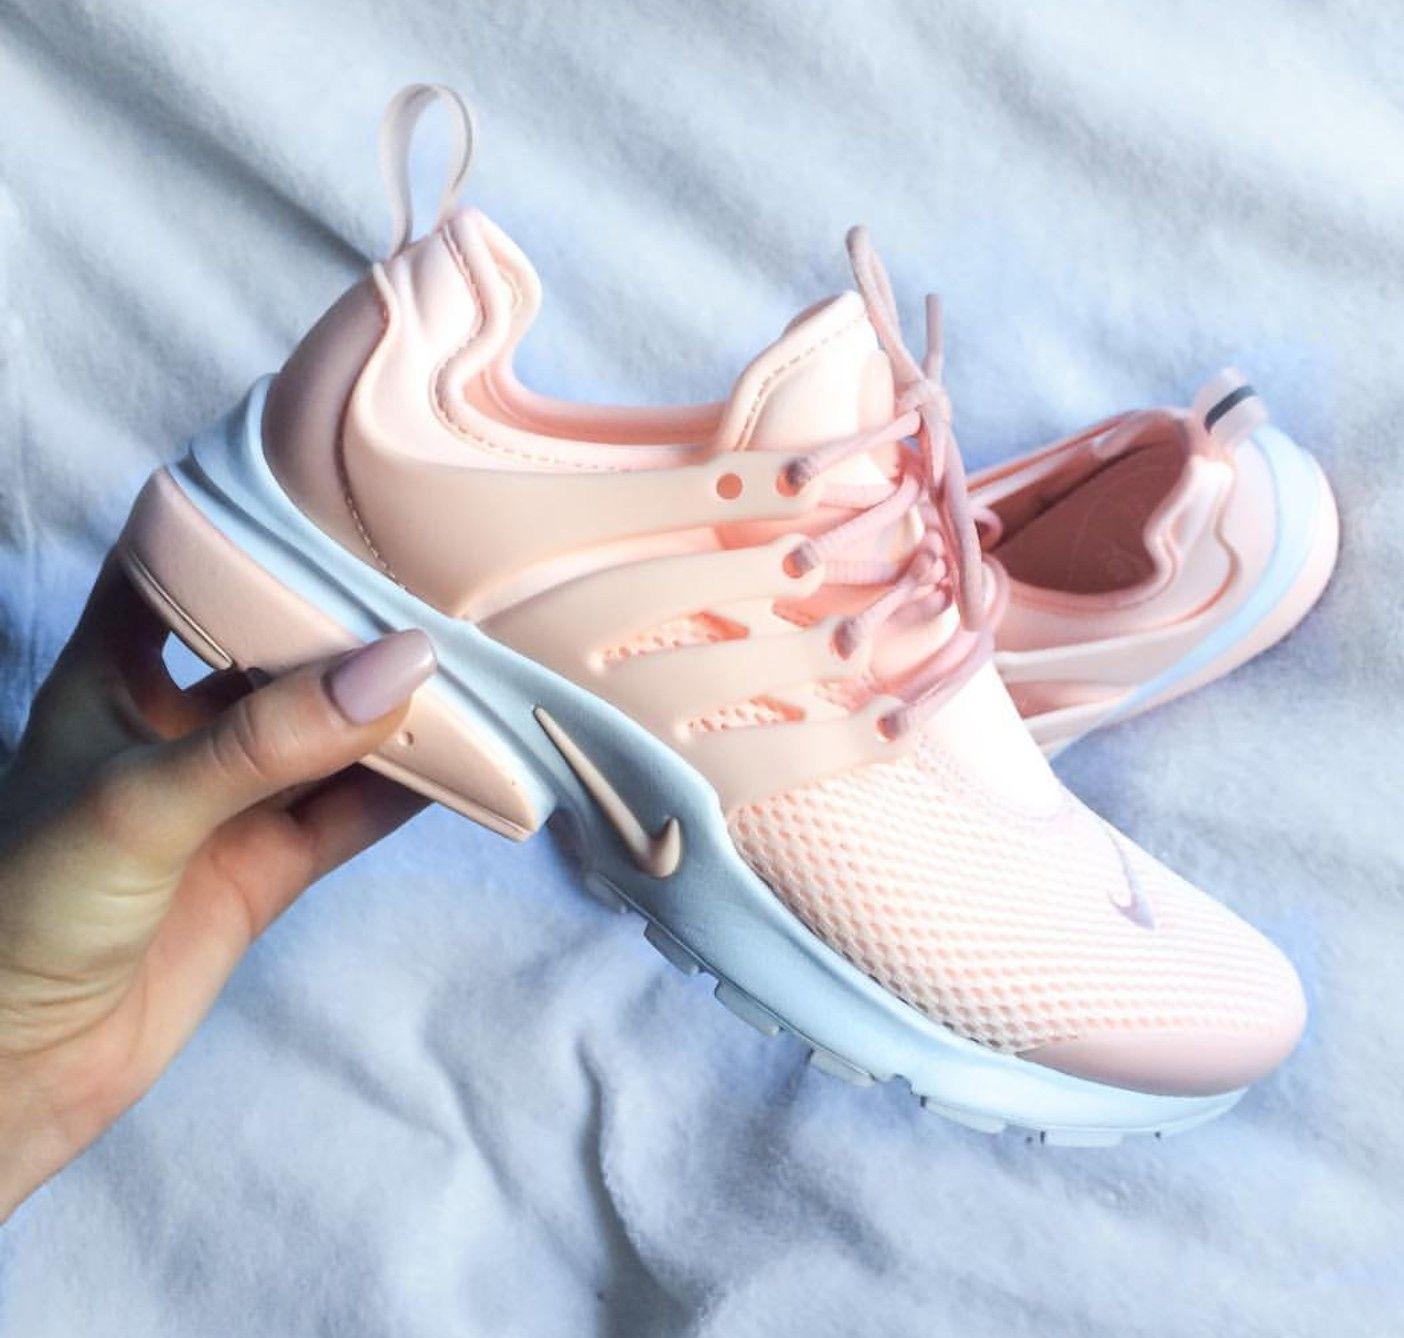 Nike Air Presto In Lachs Rosa Foto Jessnugent1 Instagram Turnschuhe Damen Nike Presto Turnschuhe Herren